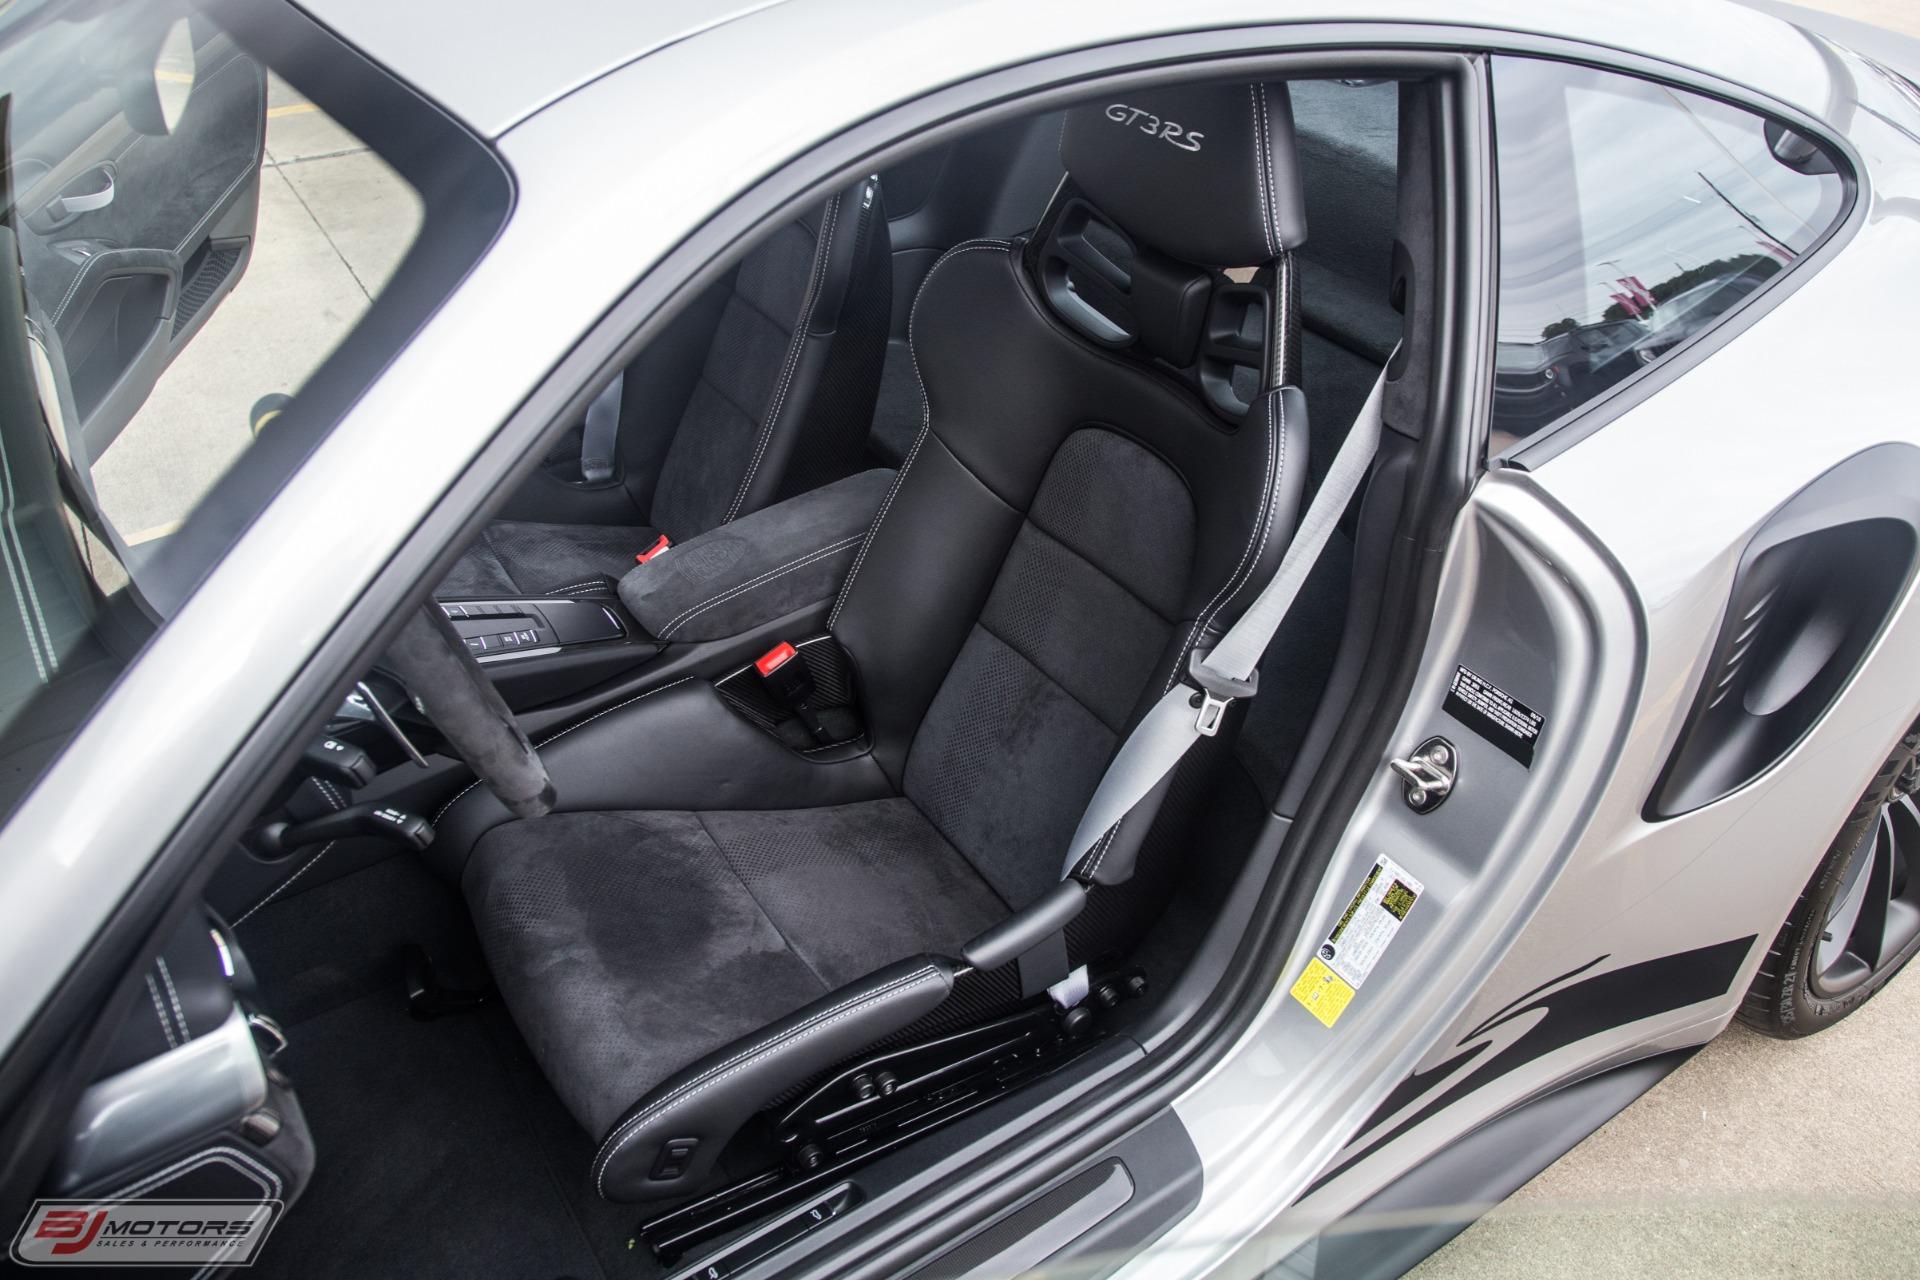 Used 2019 Porsche 911 Gt3 Rs For Sale 234 995 Bj Motors Stock Ks164604